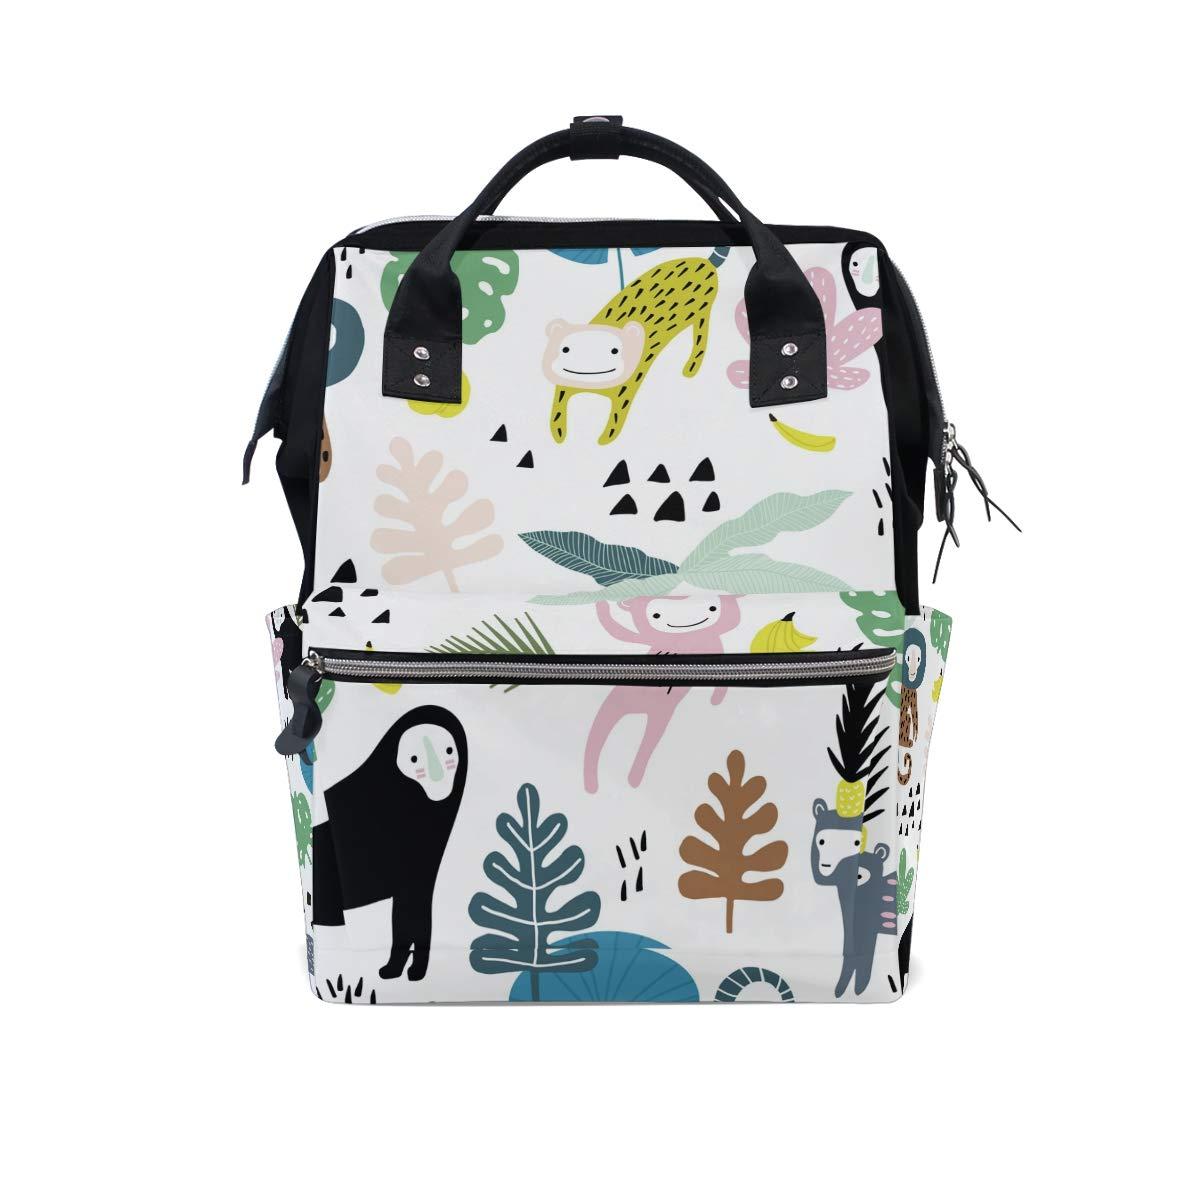 MERRYSUGAR Diaper Bag Backpack Cute Monkey Banana Multifunction Travel Bag